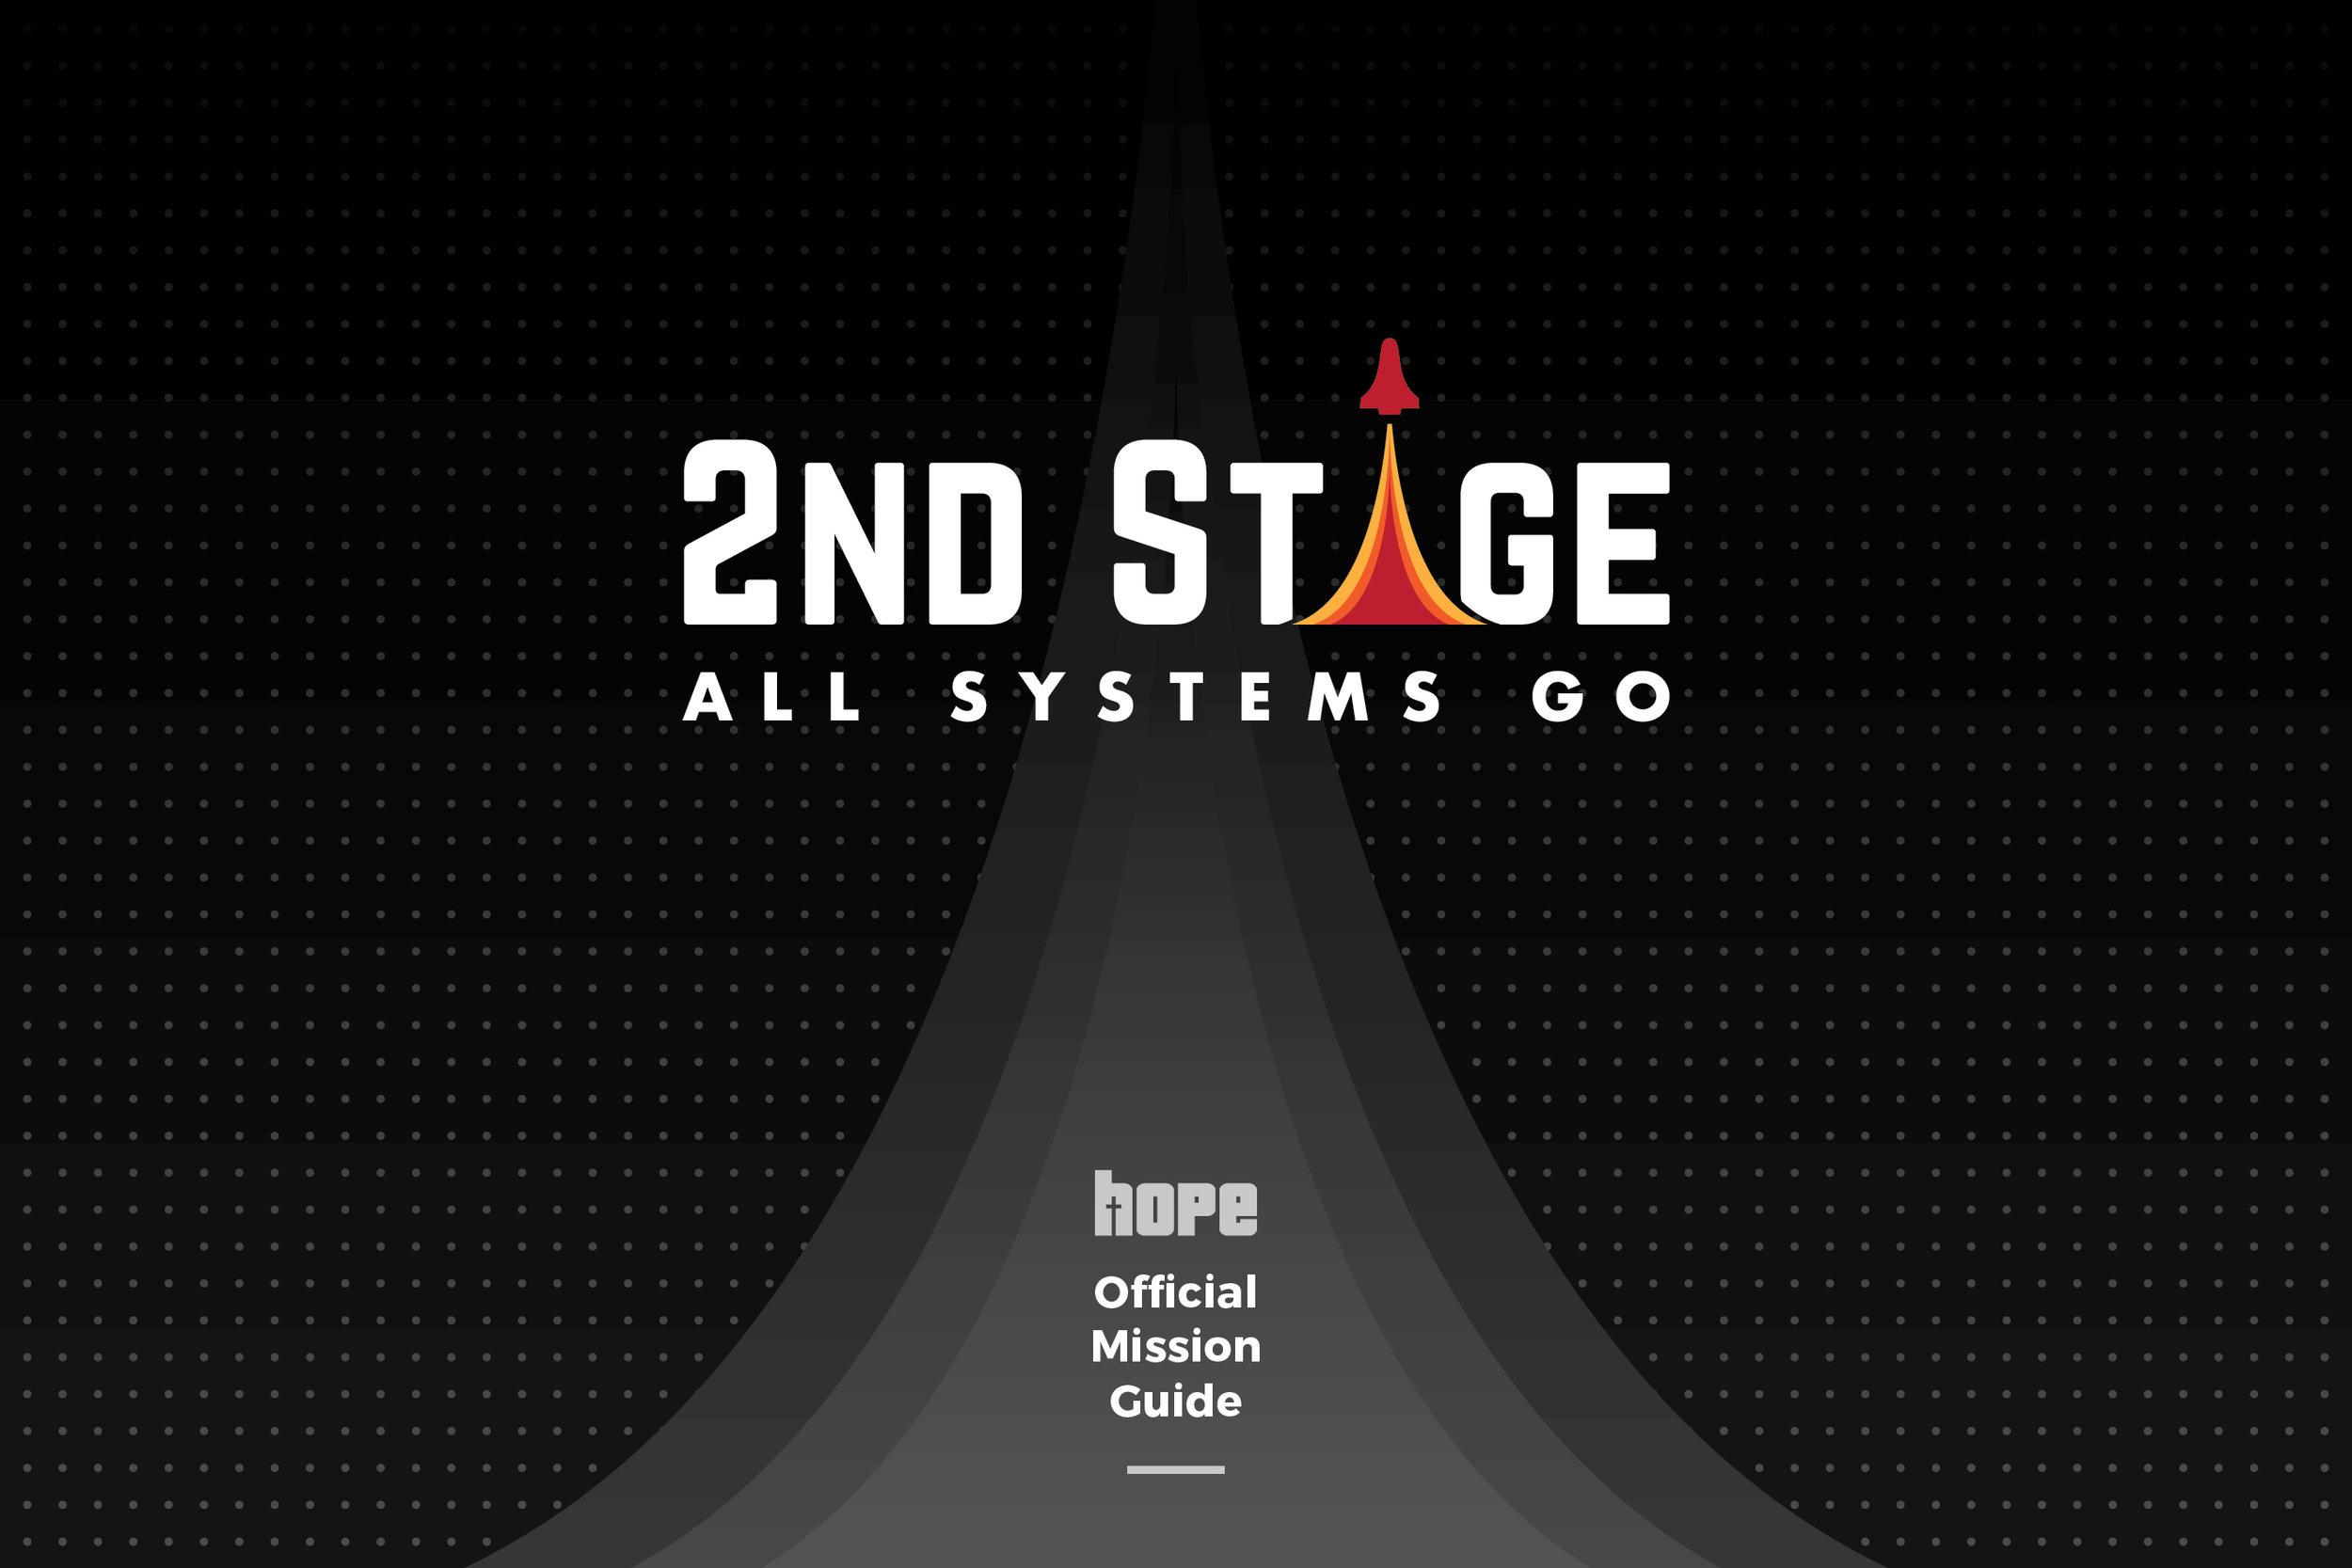 2ndStage_Booklet_BiFold_9x6_v11-FullGradient-Pages-1.jpg